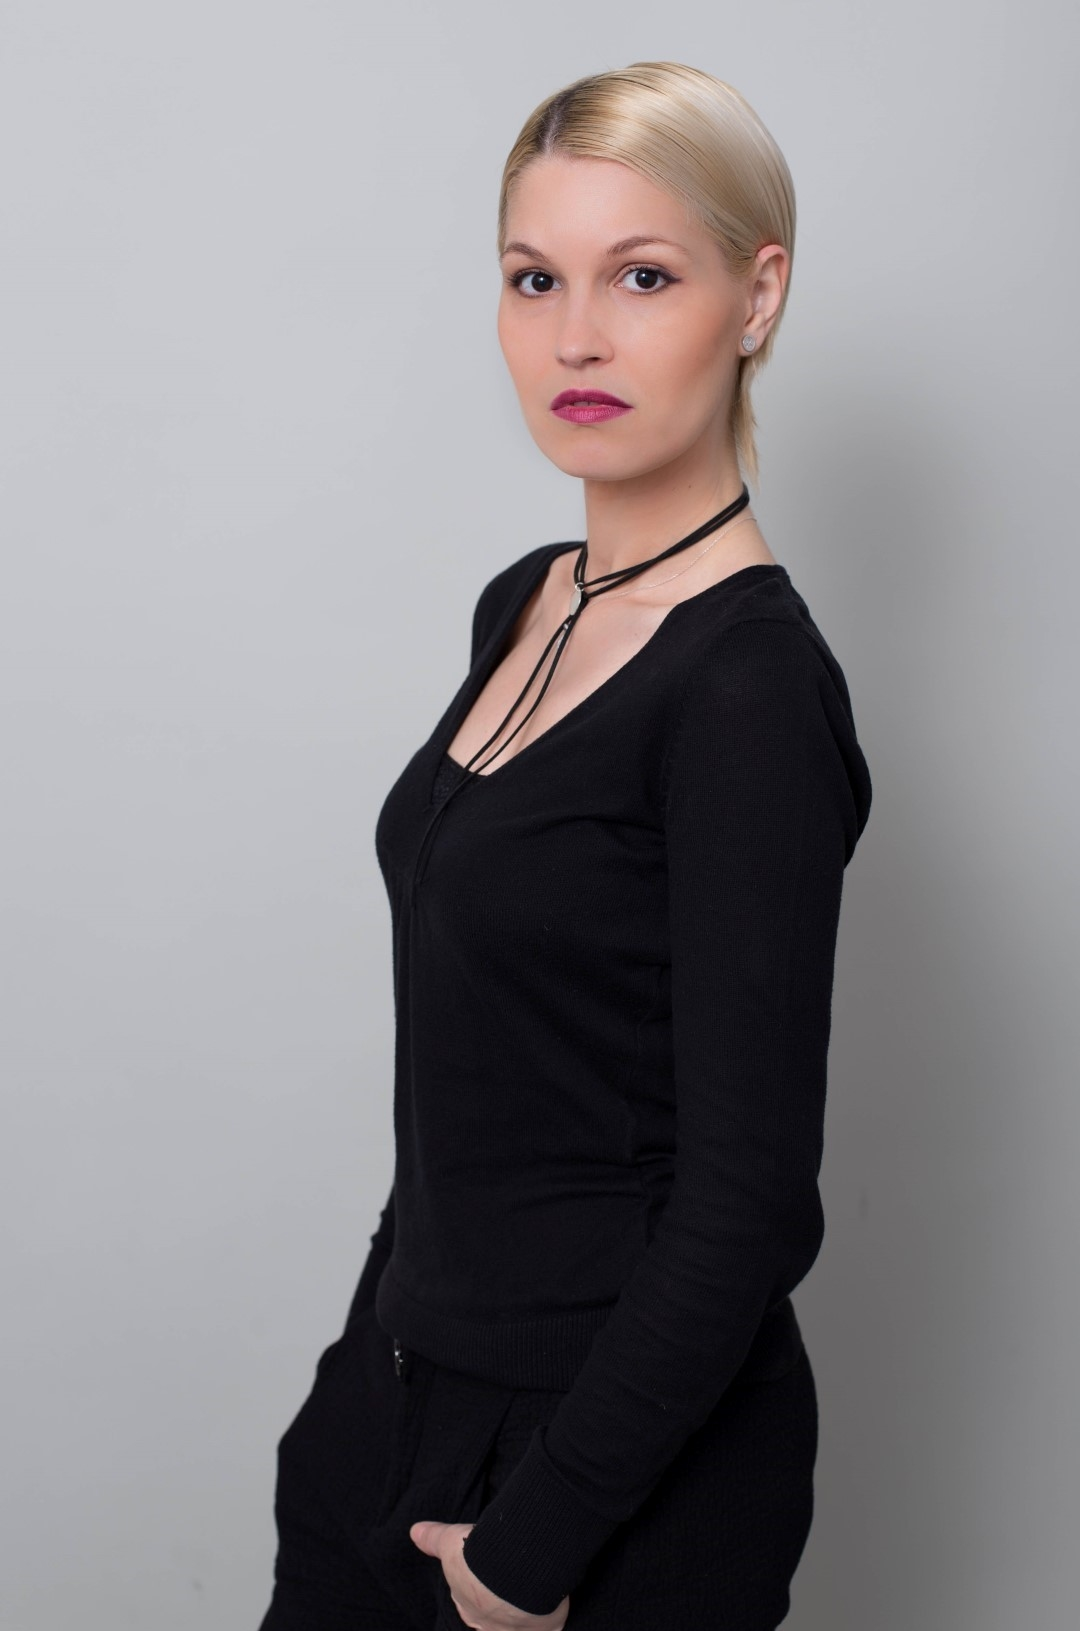 Simina Iancu